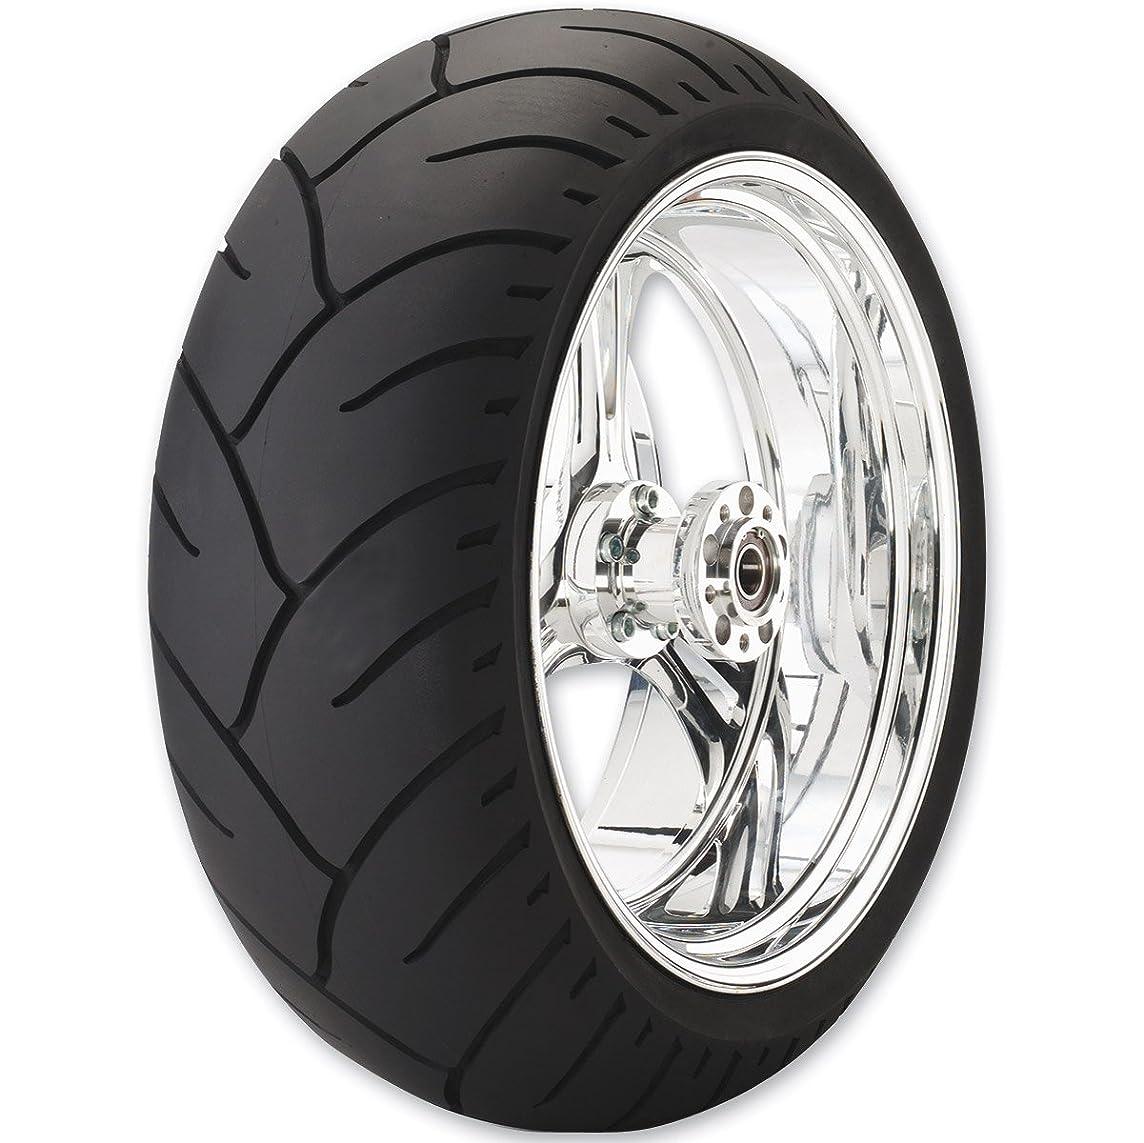 Dunlop Elite 3 250/40R18 Rear Tire 45091292